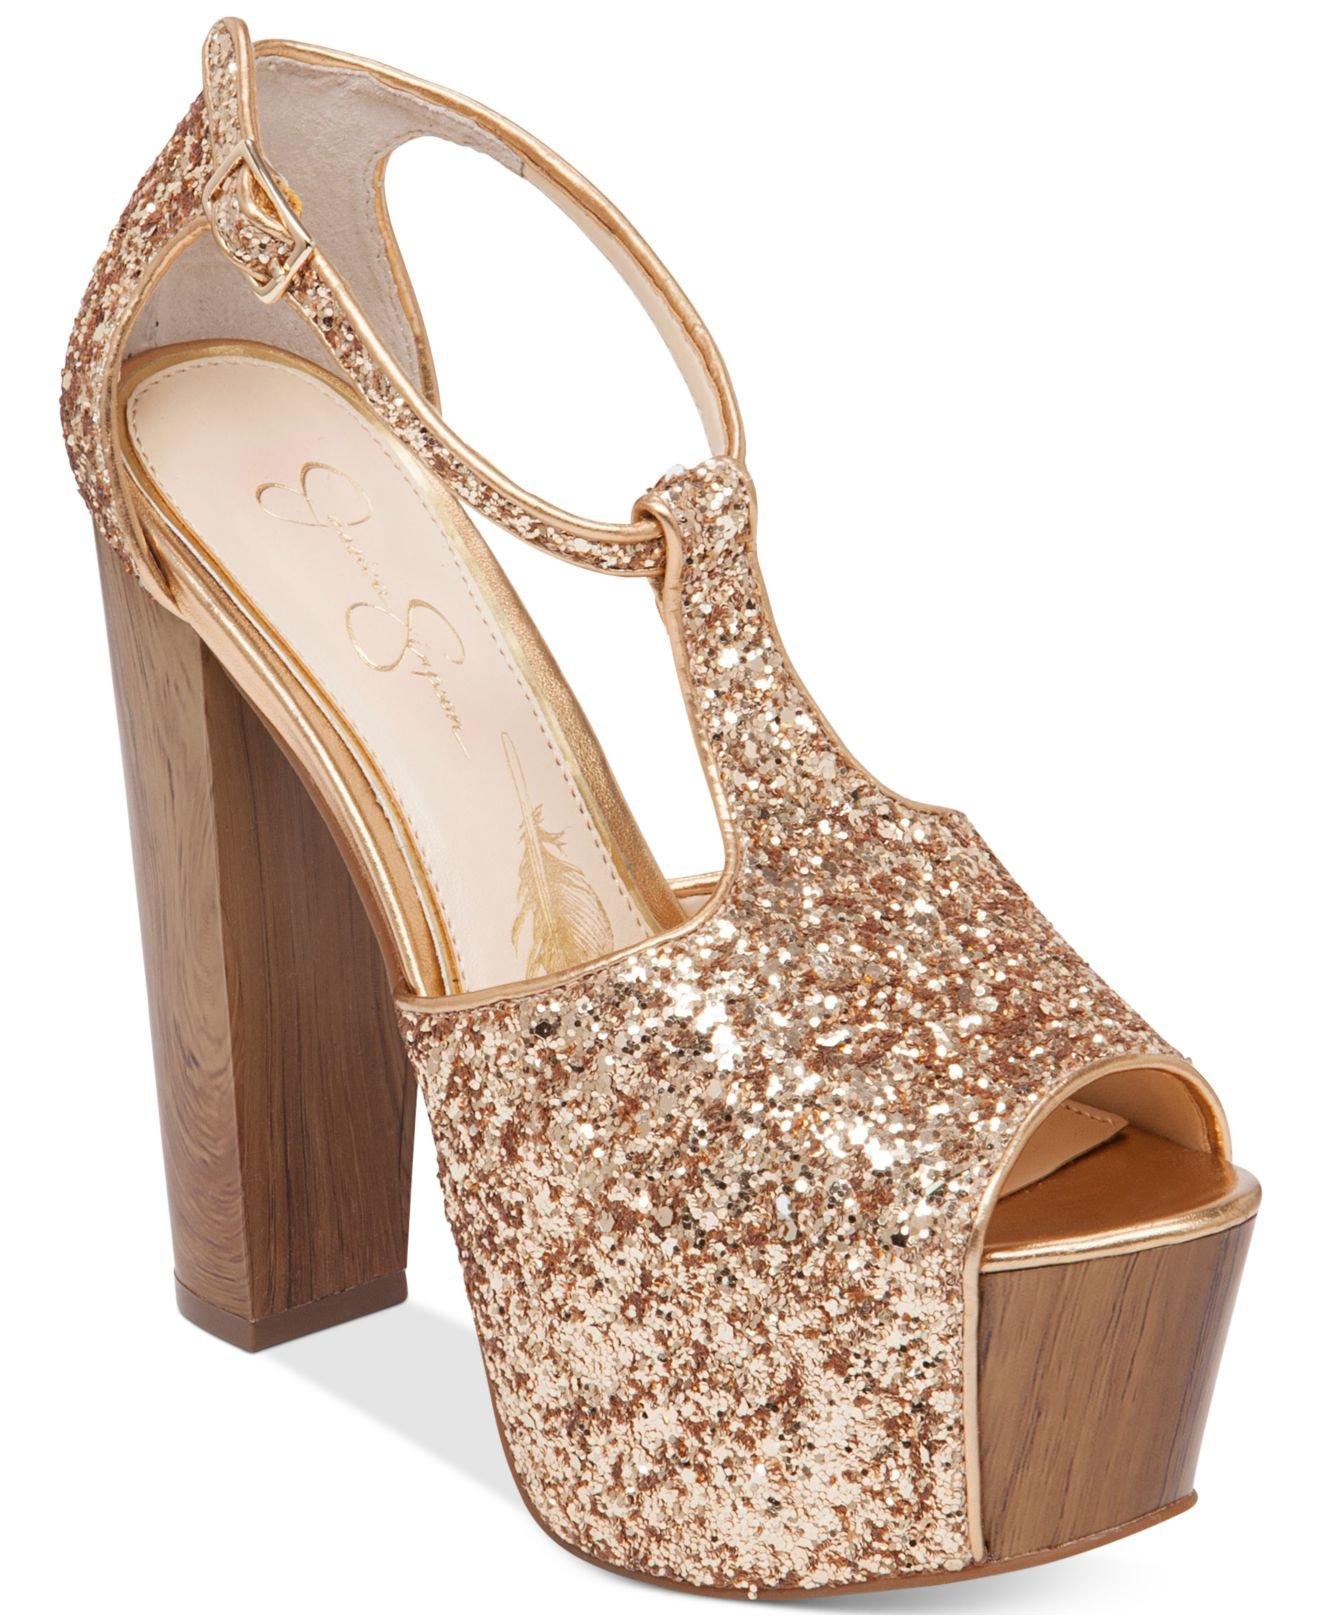 5aff092940d Lyst - Jessica Simpson Dany T-strap Platform Dress Sandals in Metallic